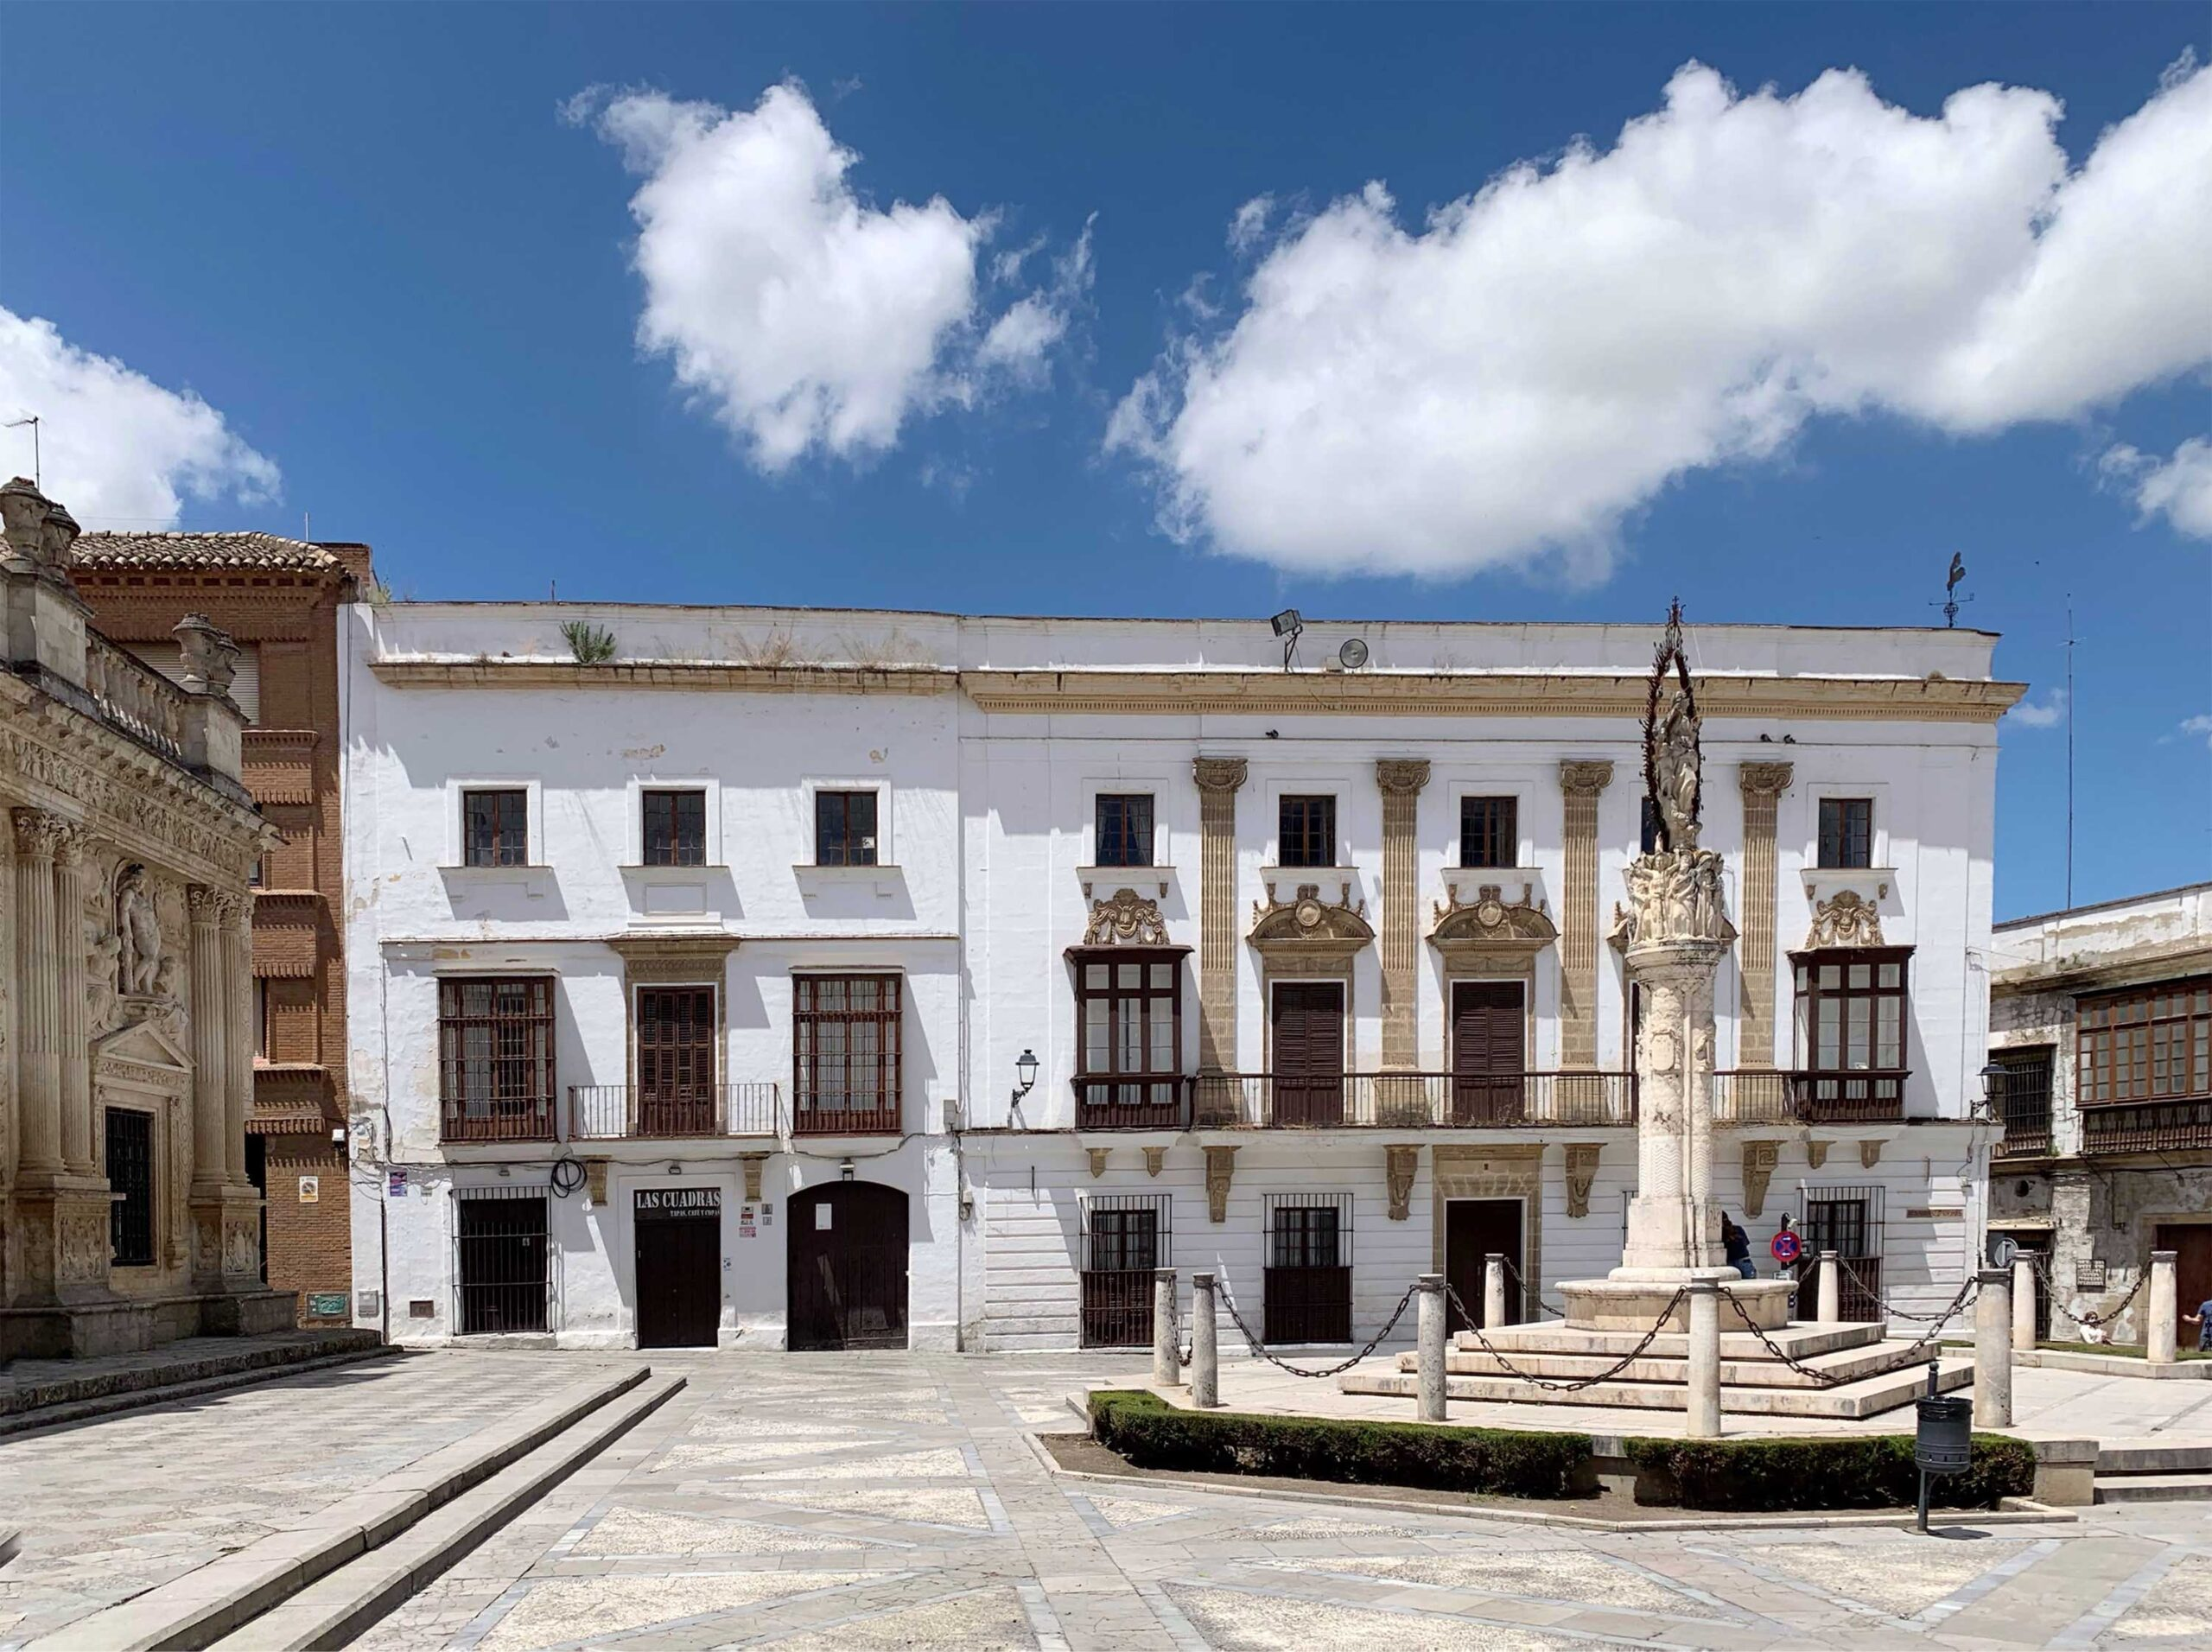 Tabancos Tour Jerez Jerez, a city to ve slowly enjoyed, Paladar y Tomar